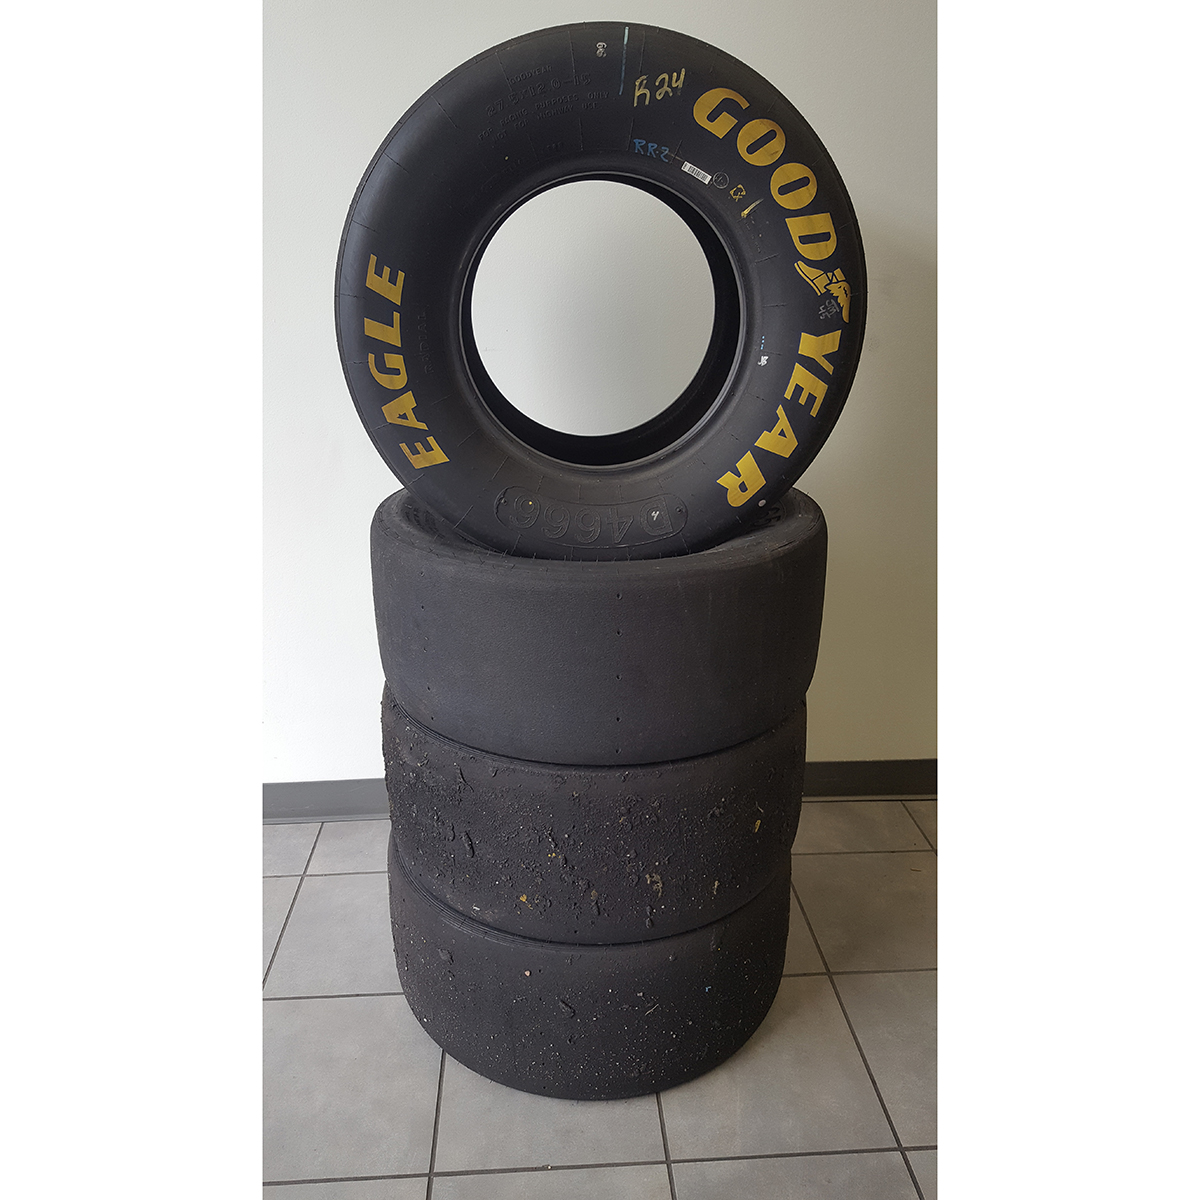 JR Motorsports #8 Race Used Tire